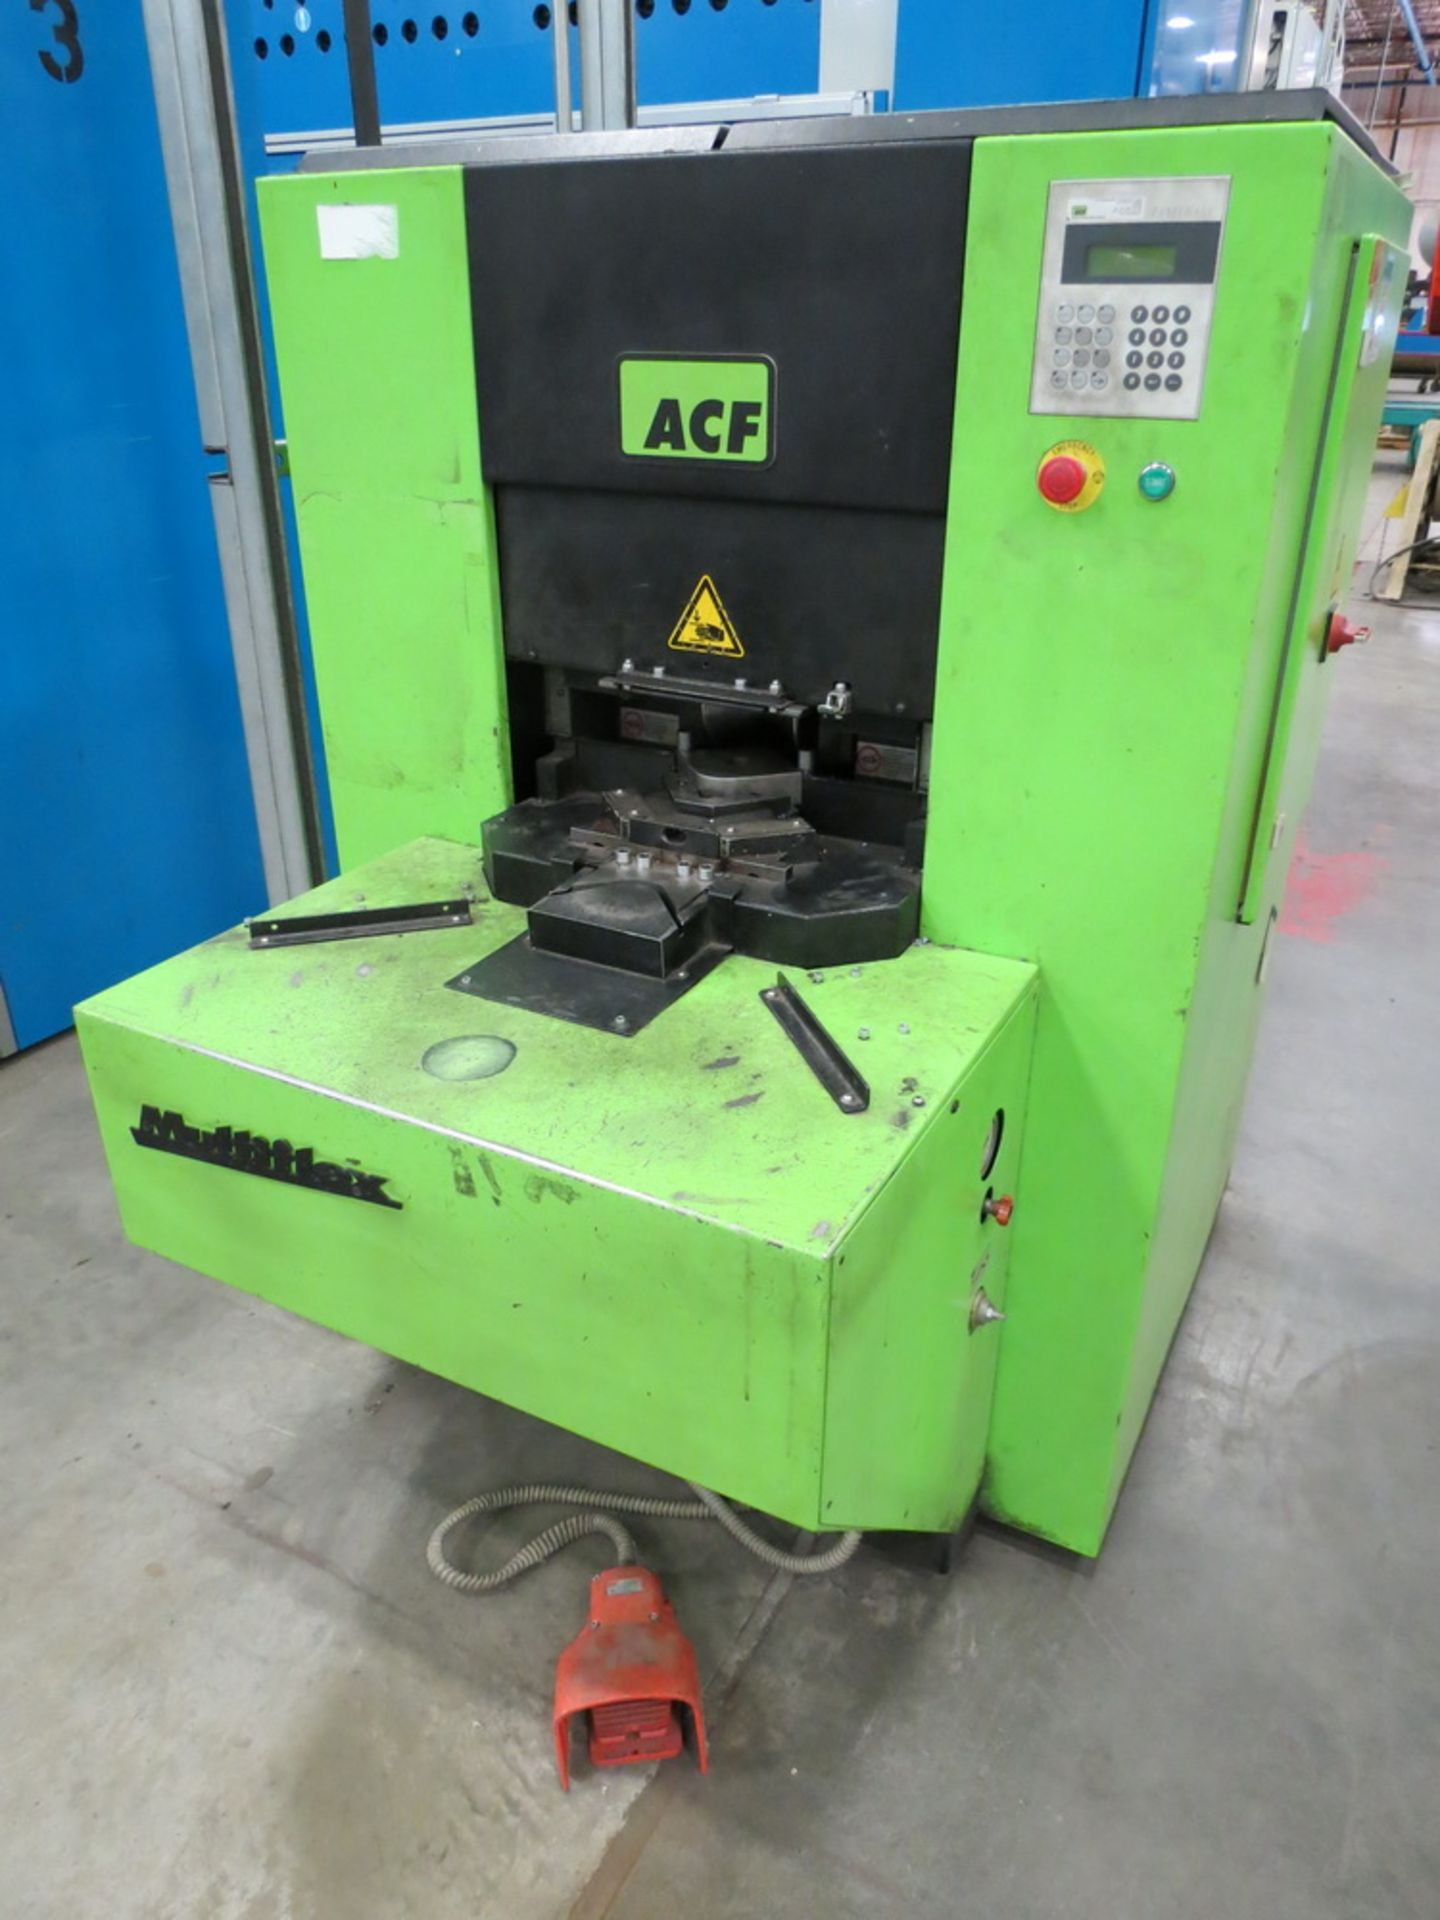 Lot 48 - 2014 ACF Engineering Model MF-50-313 Corner Former/Shear w/ Panelware Digital Controls